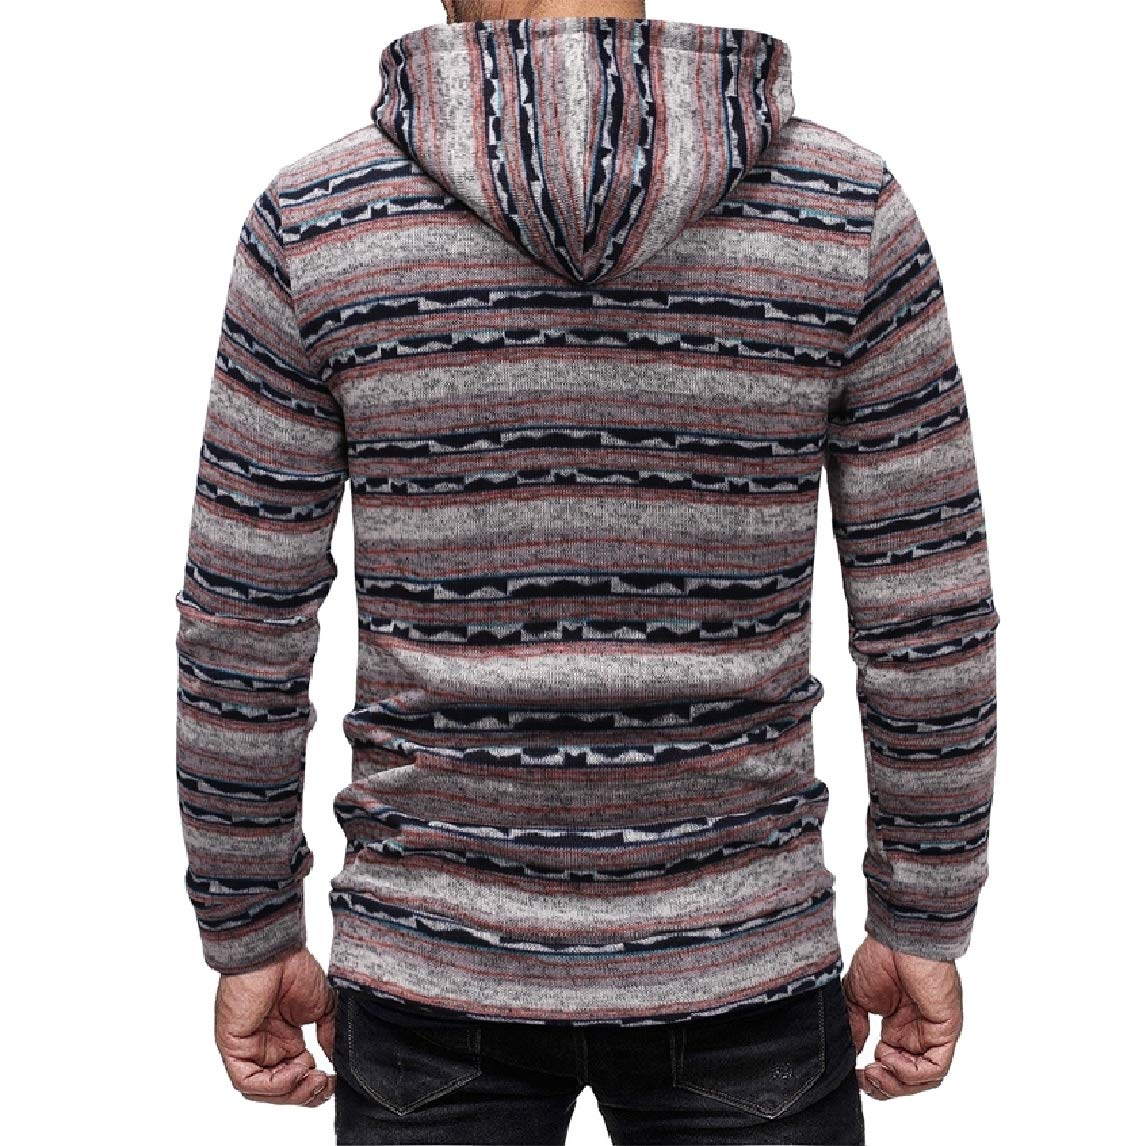 Mfasica Men Stripe Casual Activewear Long Sleeve Thickening Pullover Sweatshirt